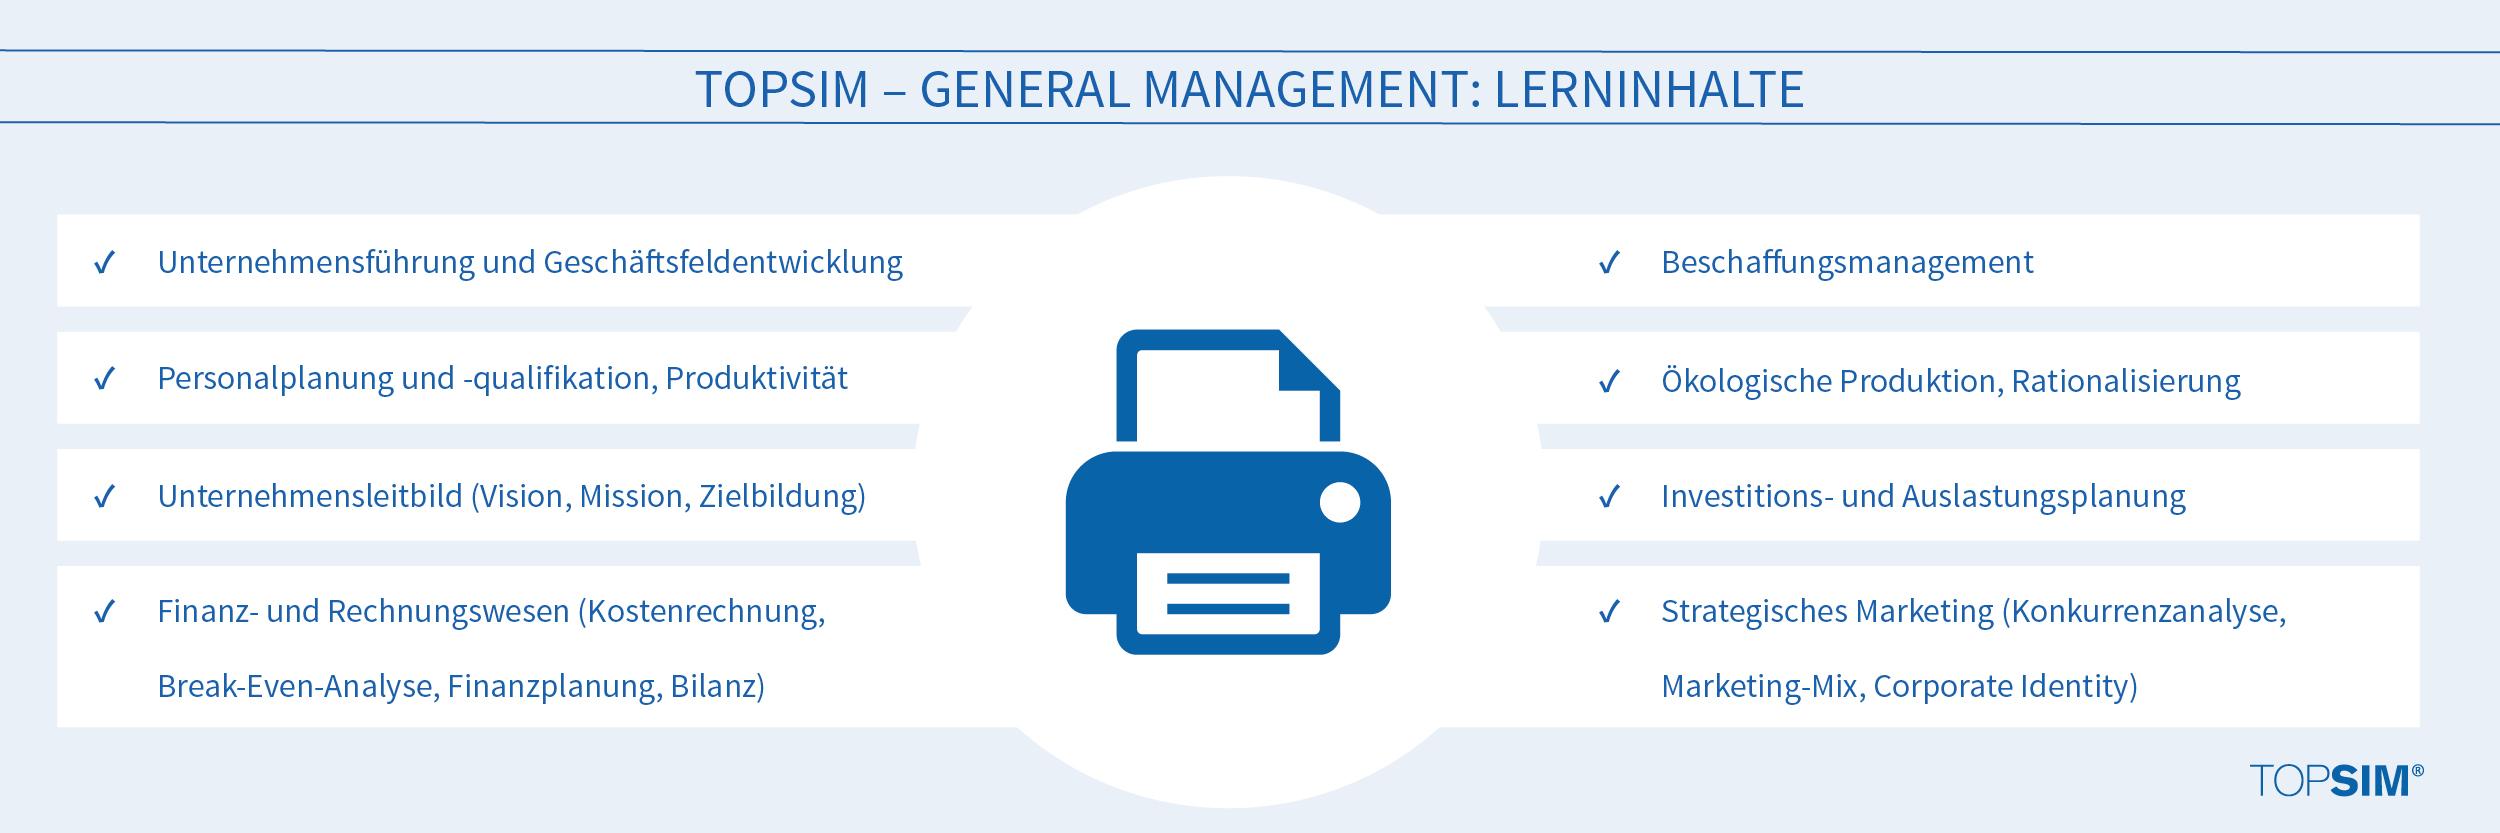 Lerninhalte TOPSIM General Management